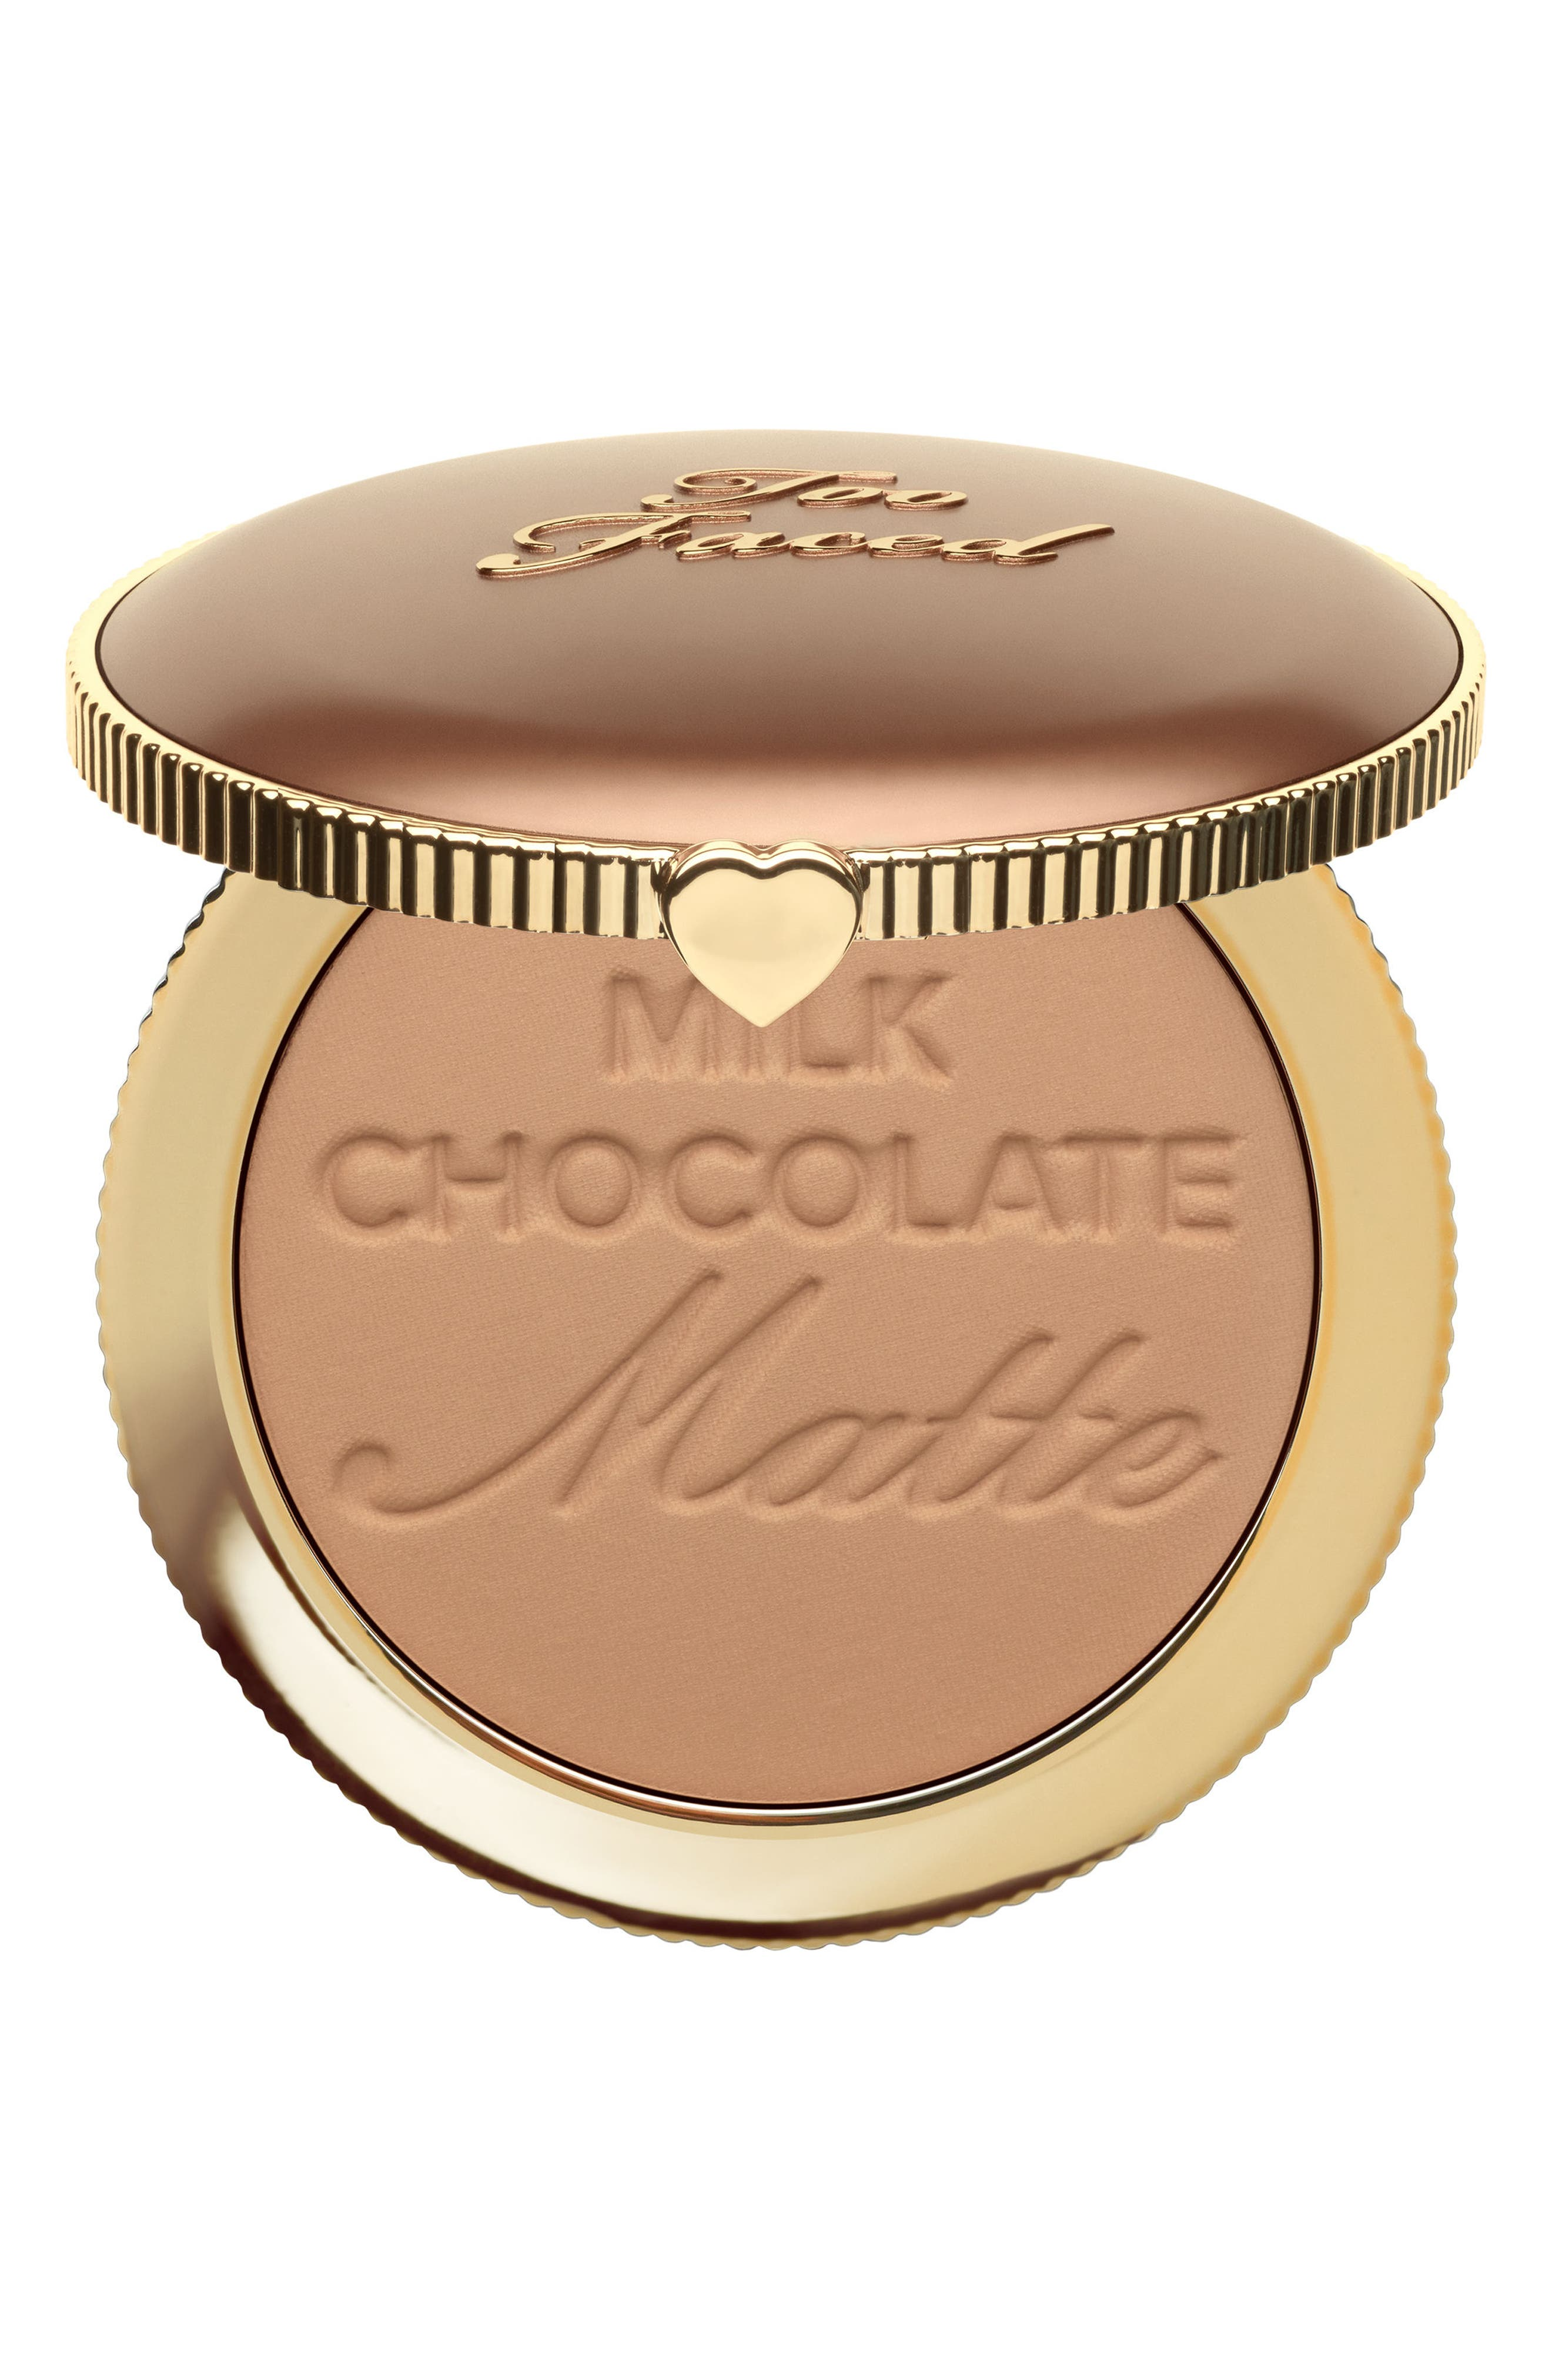 TOO FACED Chocolate Soleil Bronzer, Main, color, MILK CHOCOLATE SOLEIL